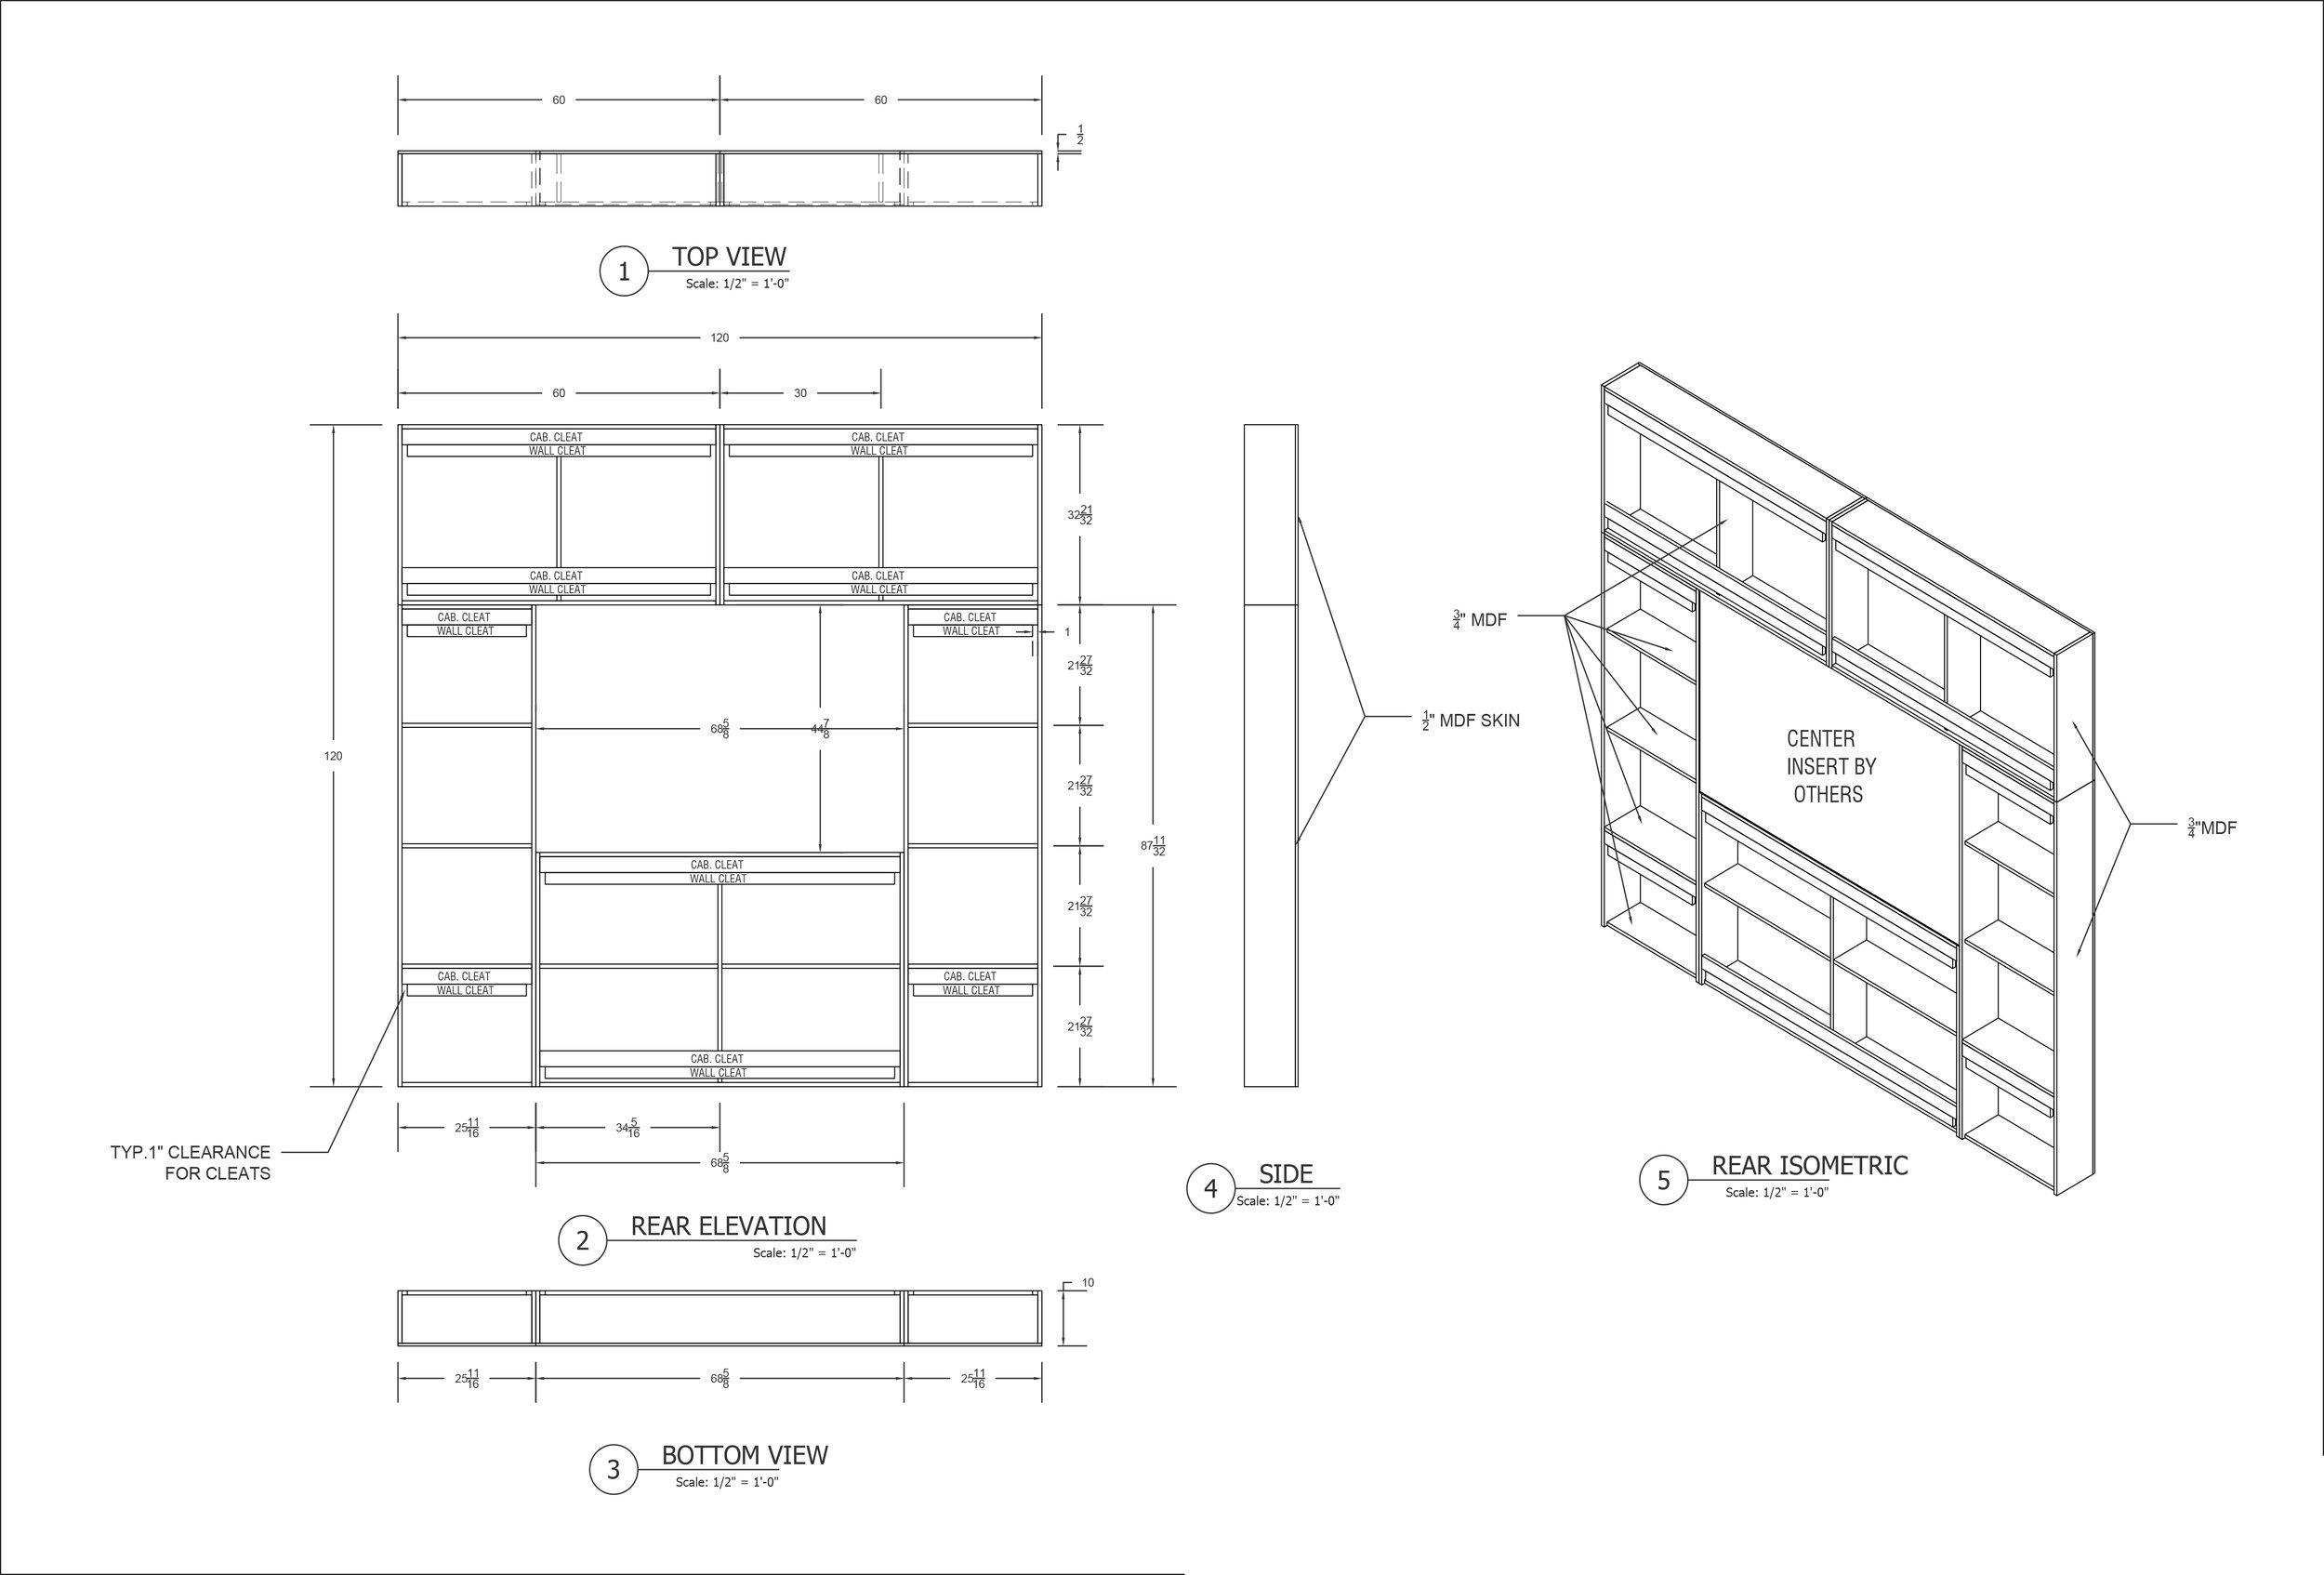 Bluegrass_Shop_-Drawings_Binder_01-10-18-39w.jpg